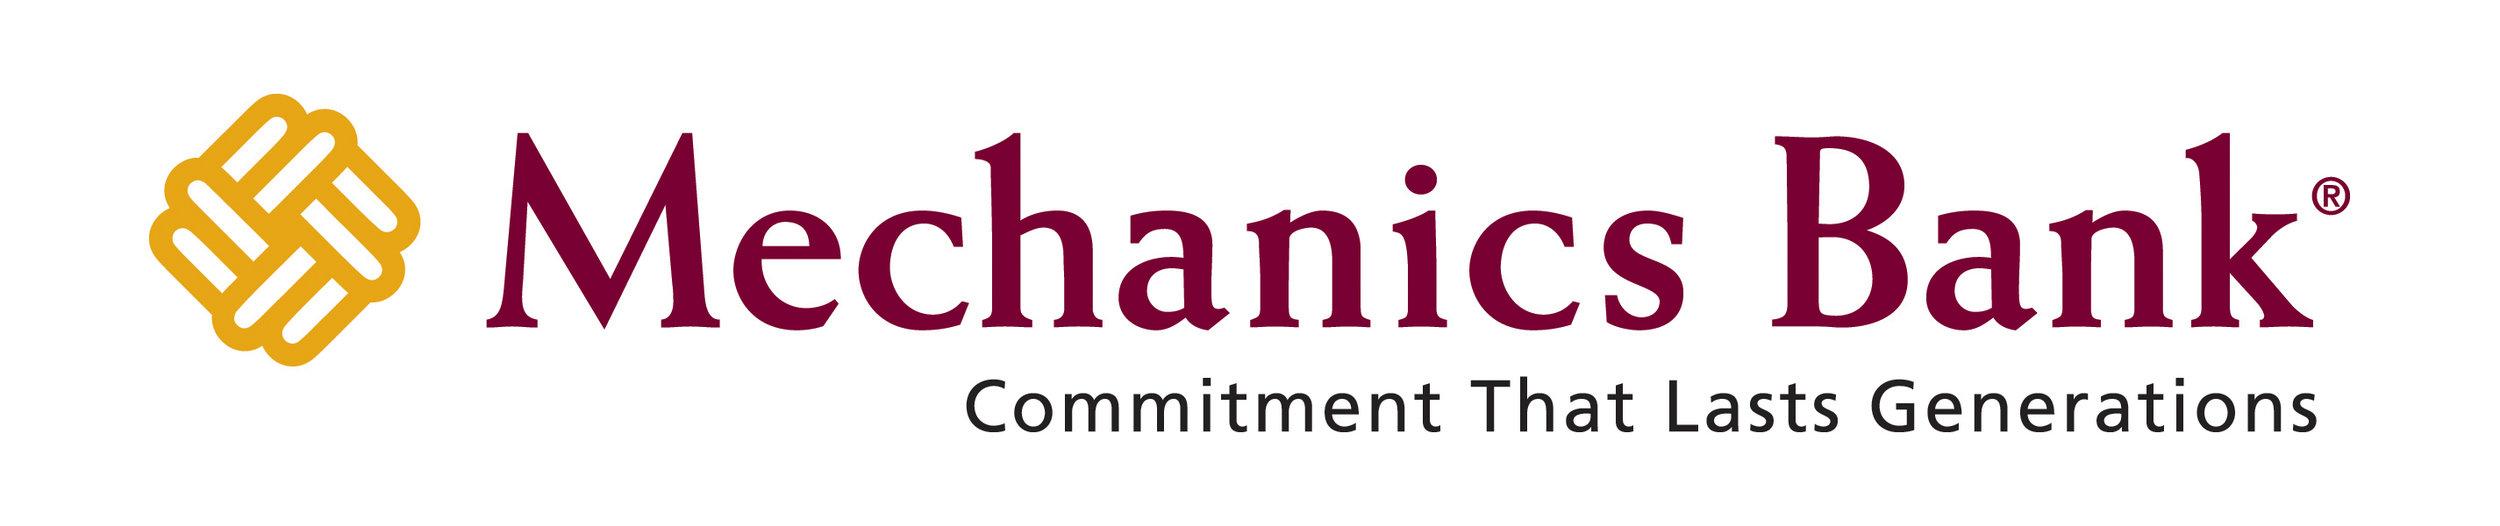 Mechanics Bank -